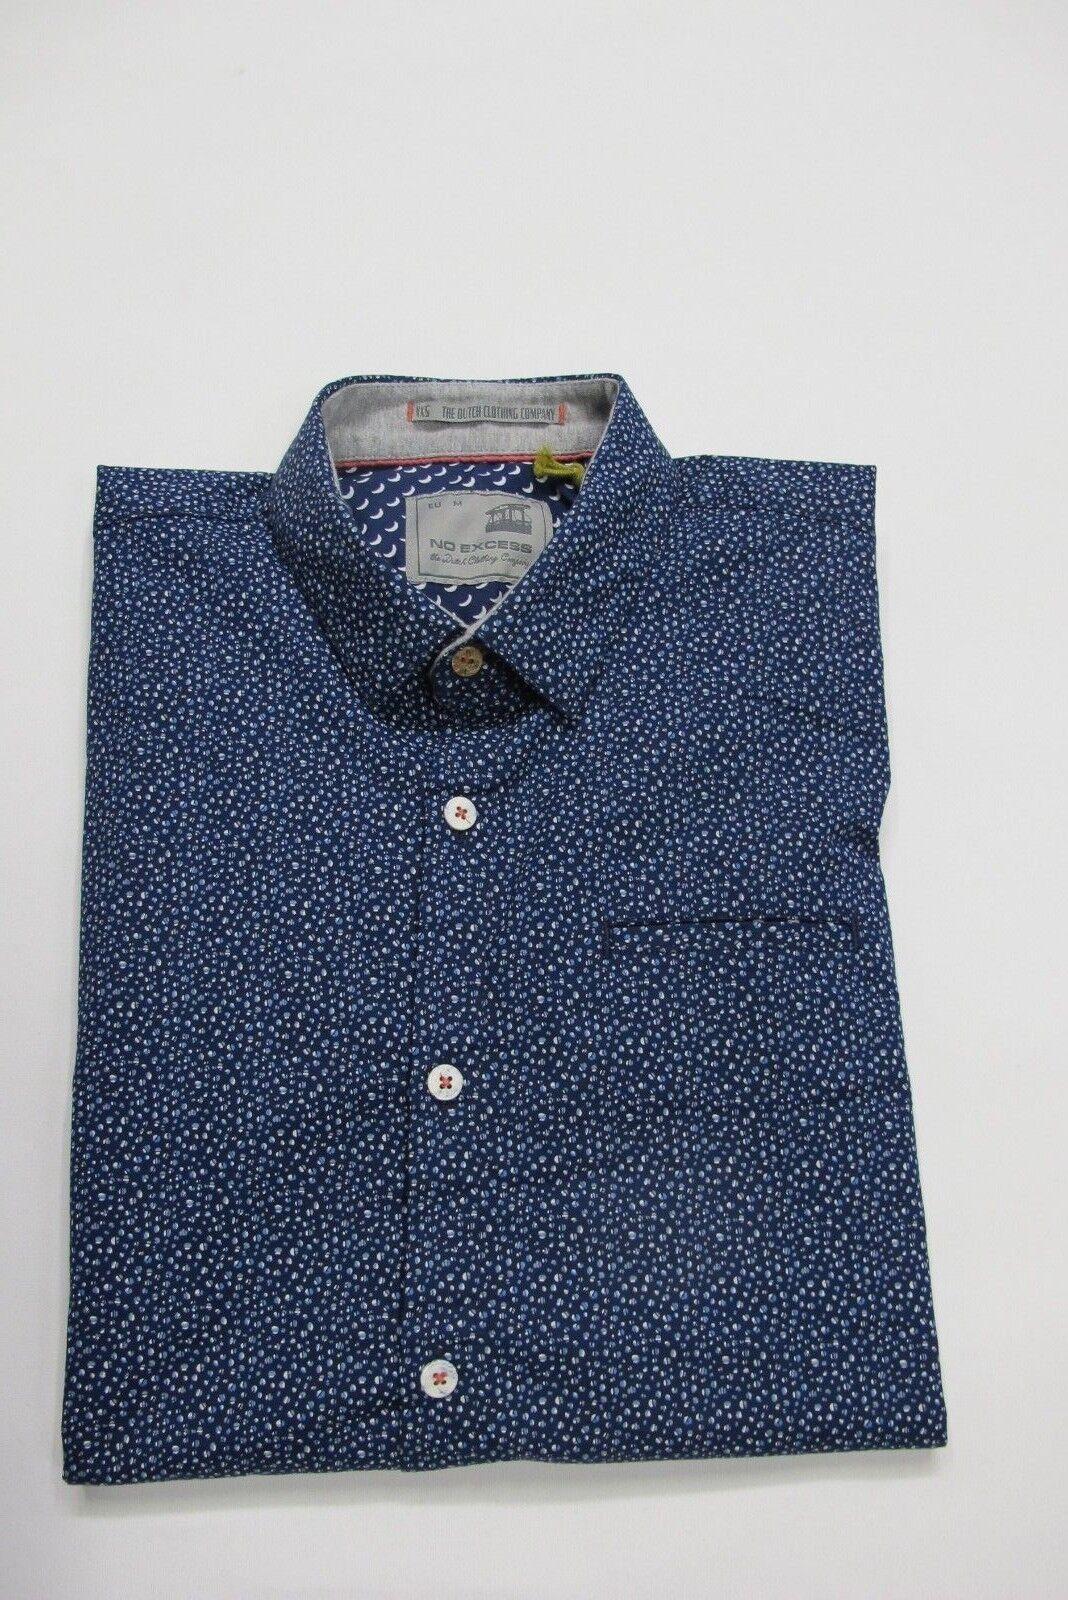 No Excess Hemd halbarm Gr. M, L, XL, 2XL, Farbe Navy mit Print UVP